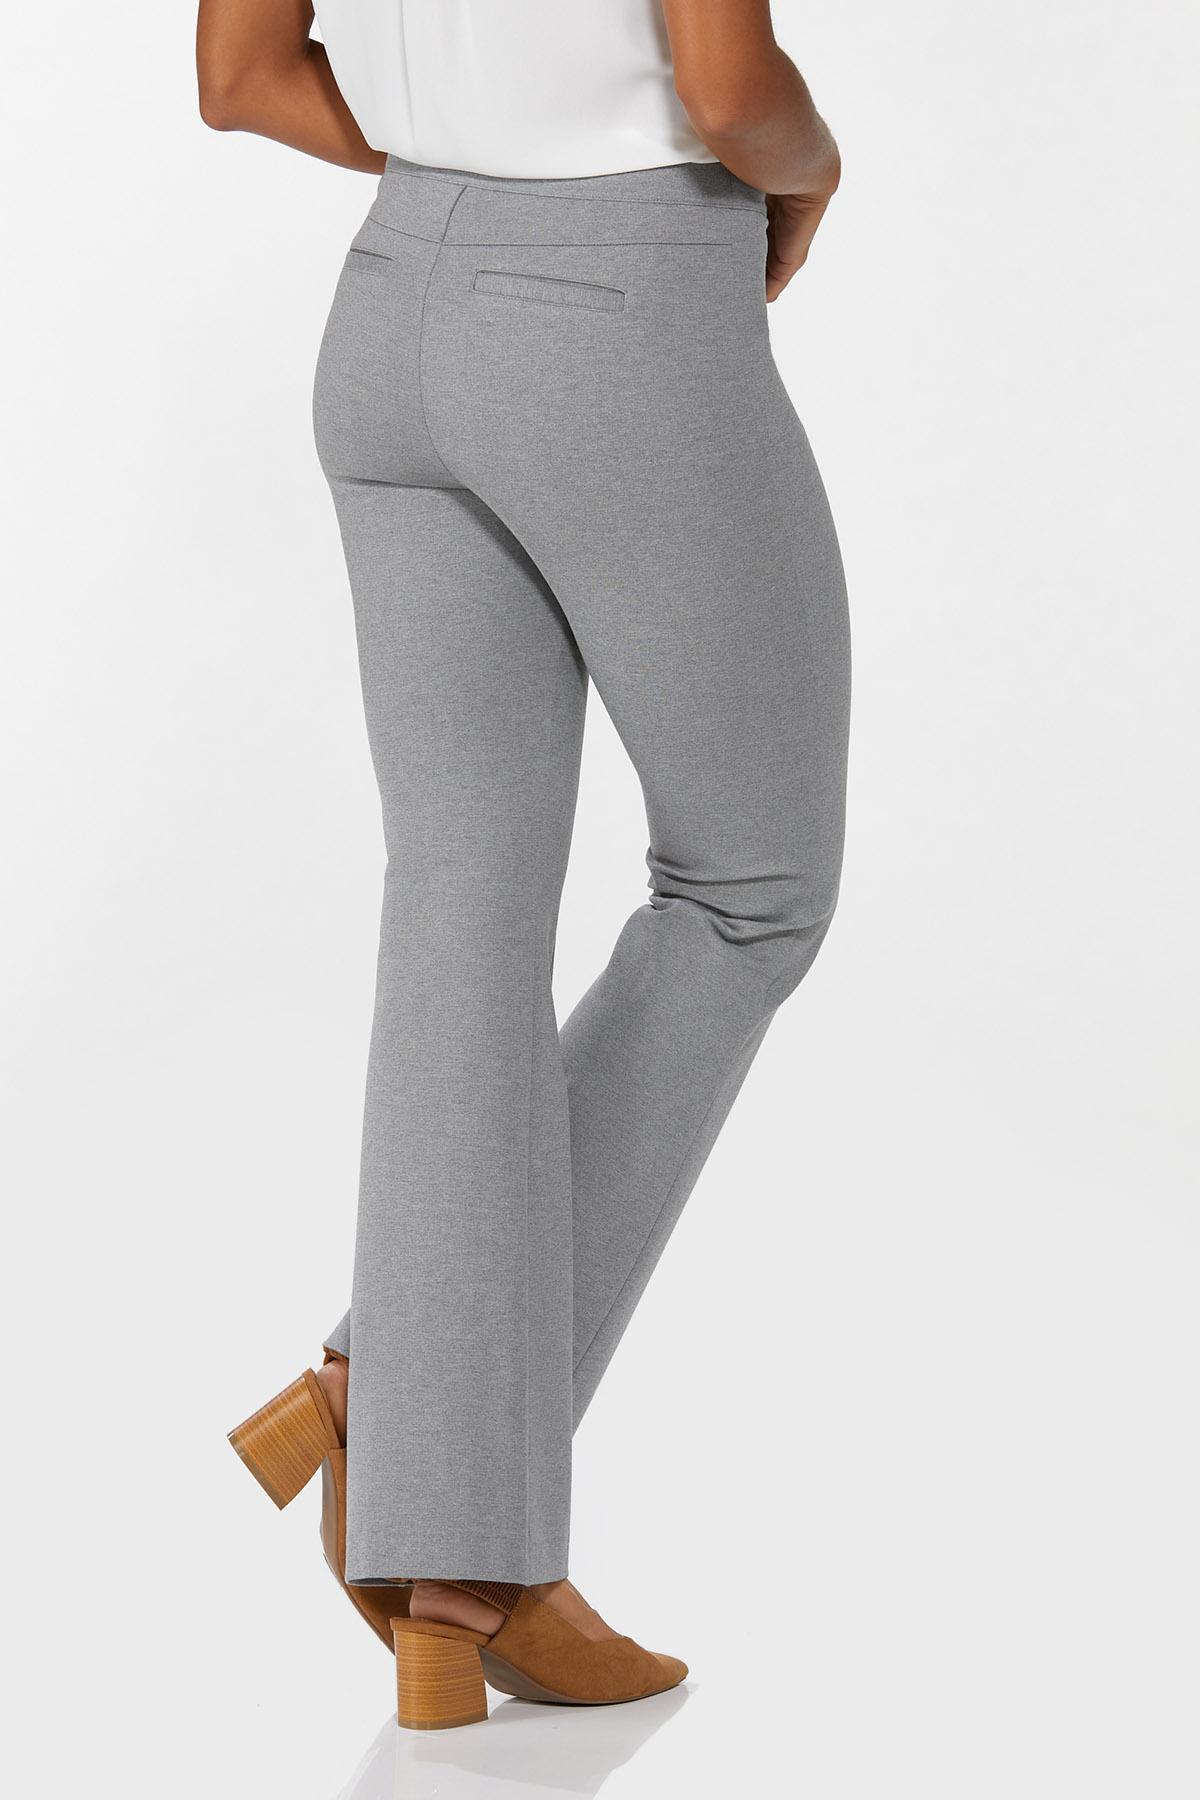 Petite Pintucked Ponte Pants (Item #44640531)